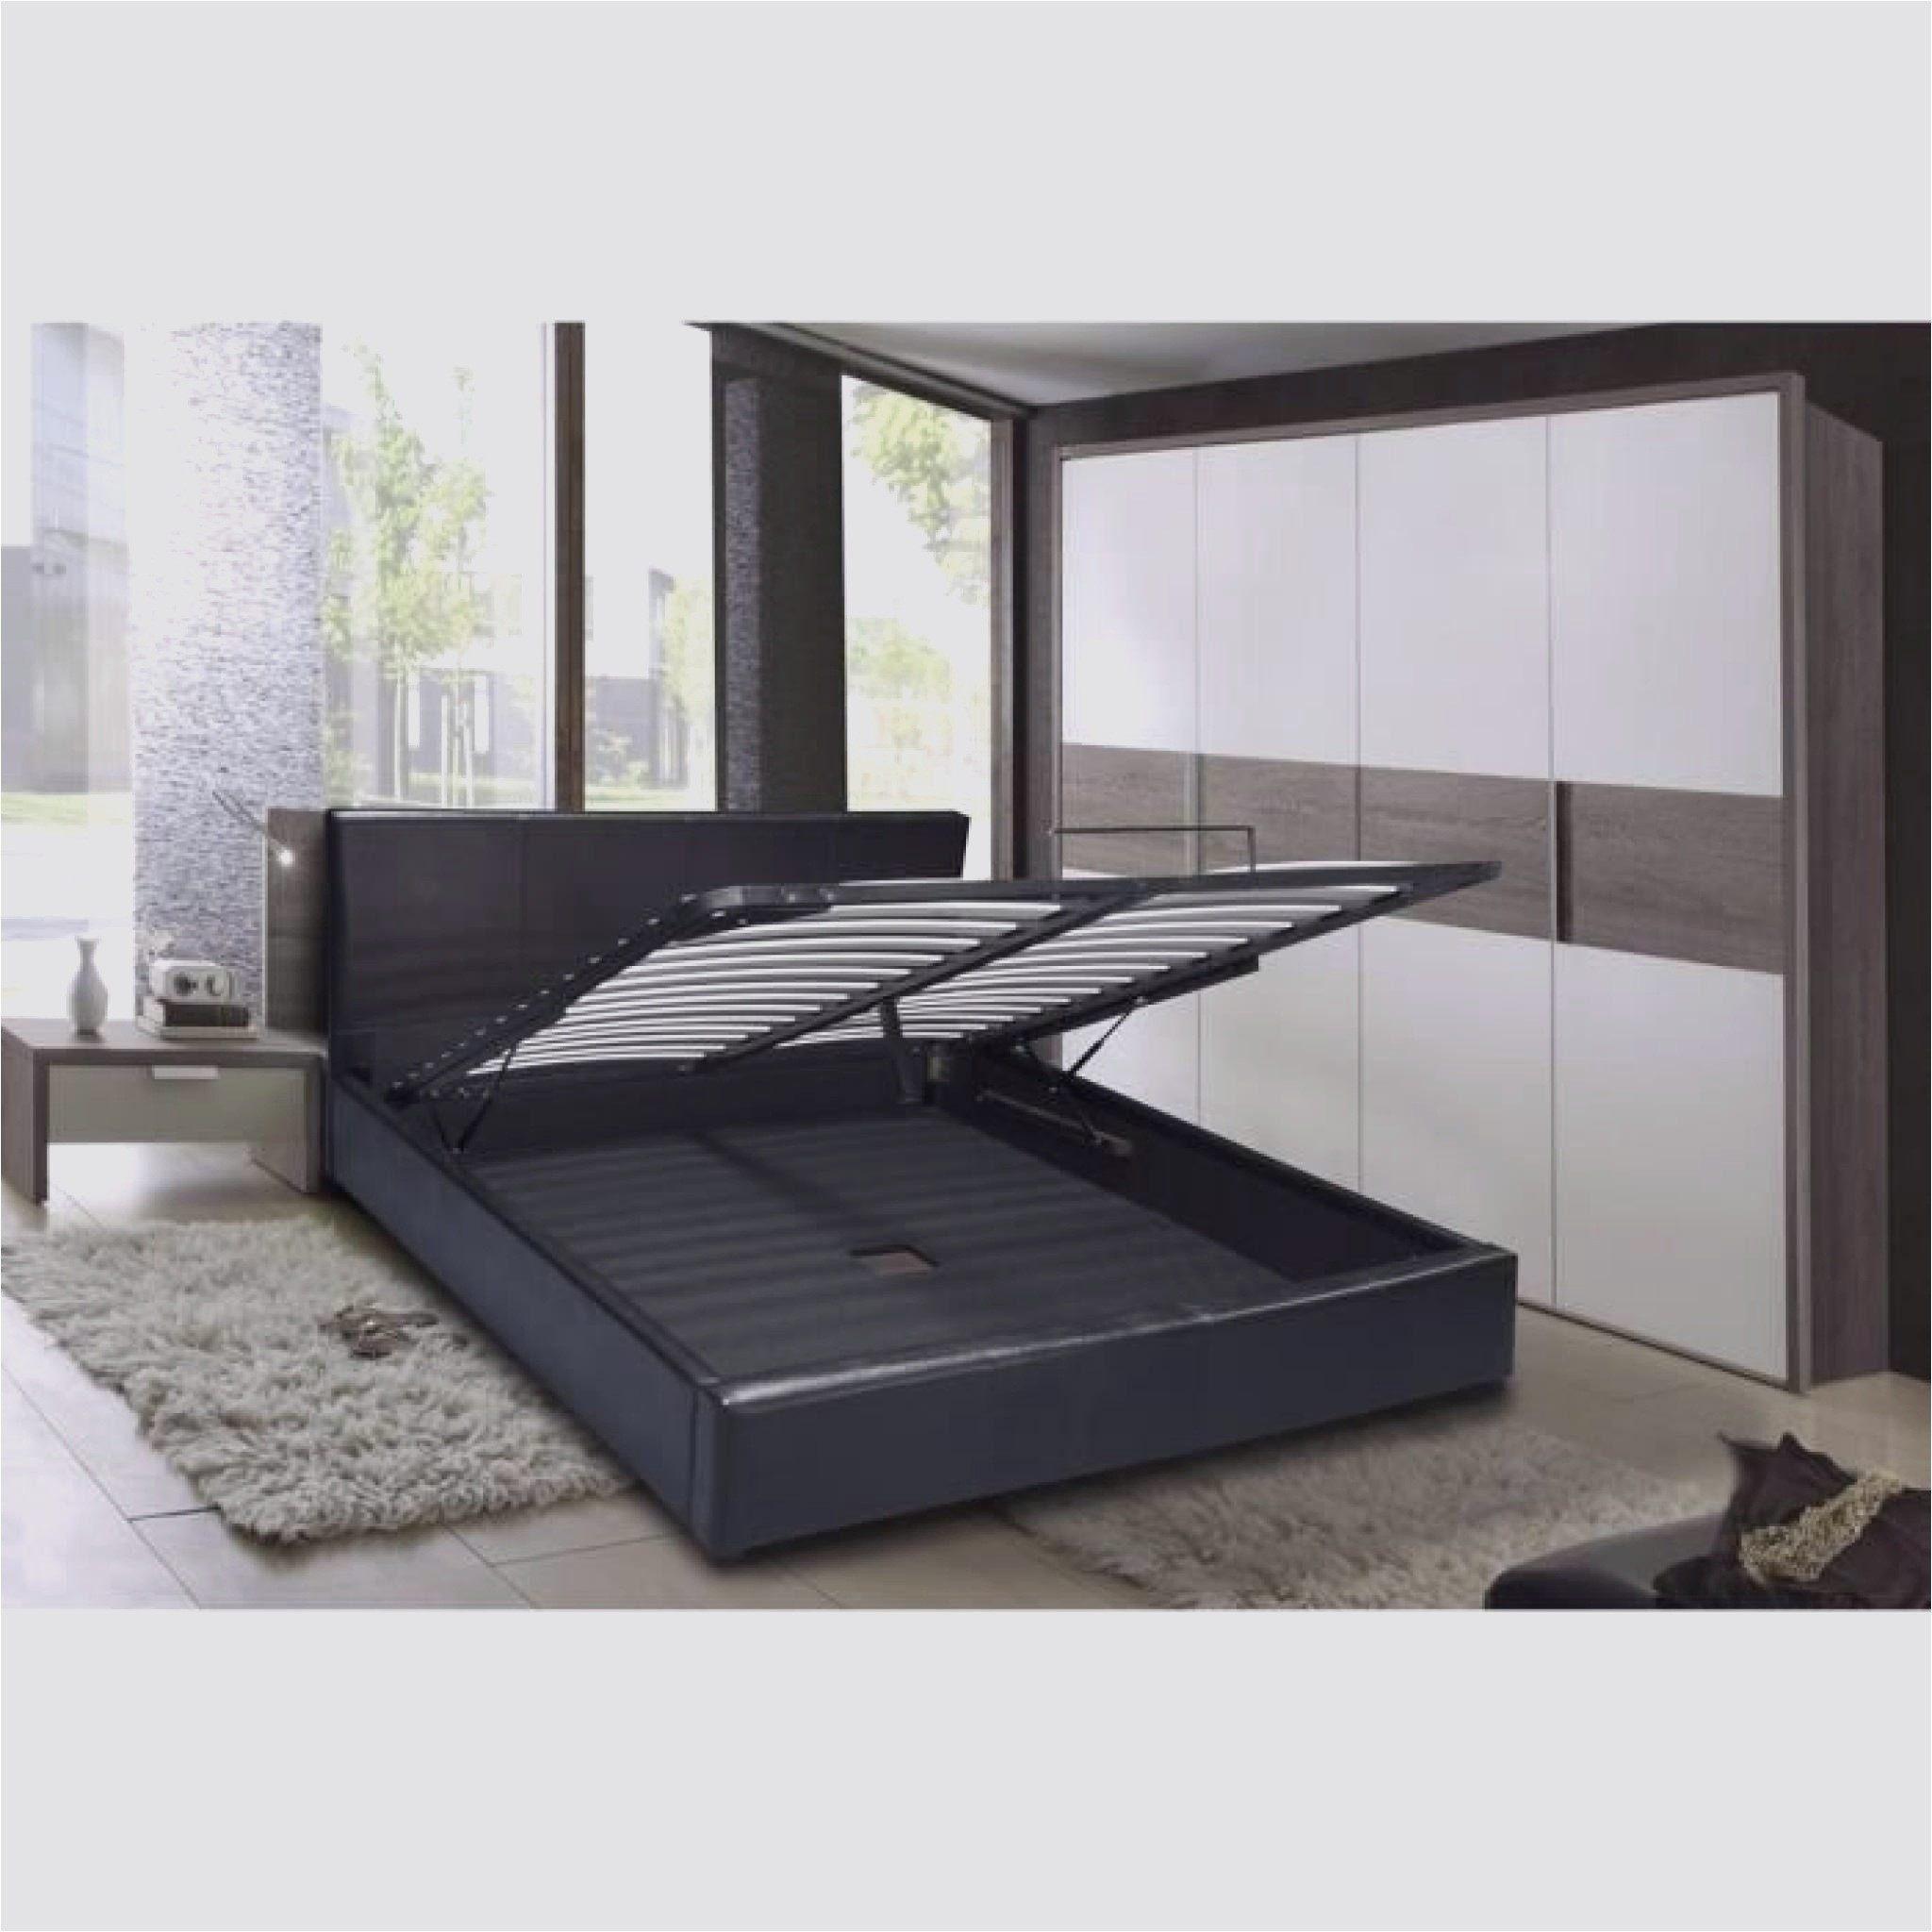 Lit Coffre 160×200 Ikea Le Luxe Lit 80 190 Lit Coffre 90—190 Conforama Rare Tiroir De Lit Conforama